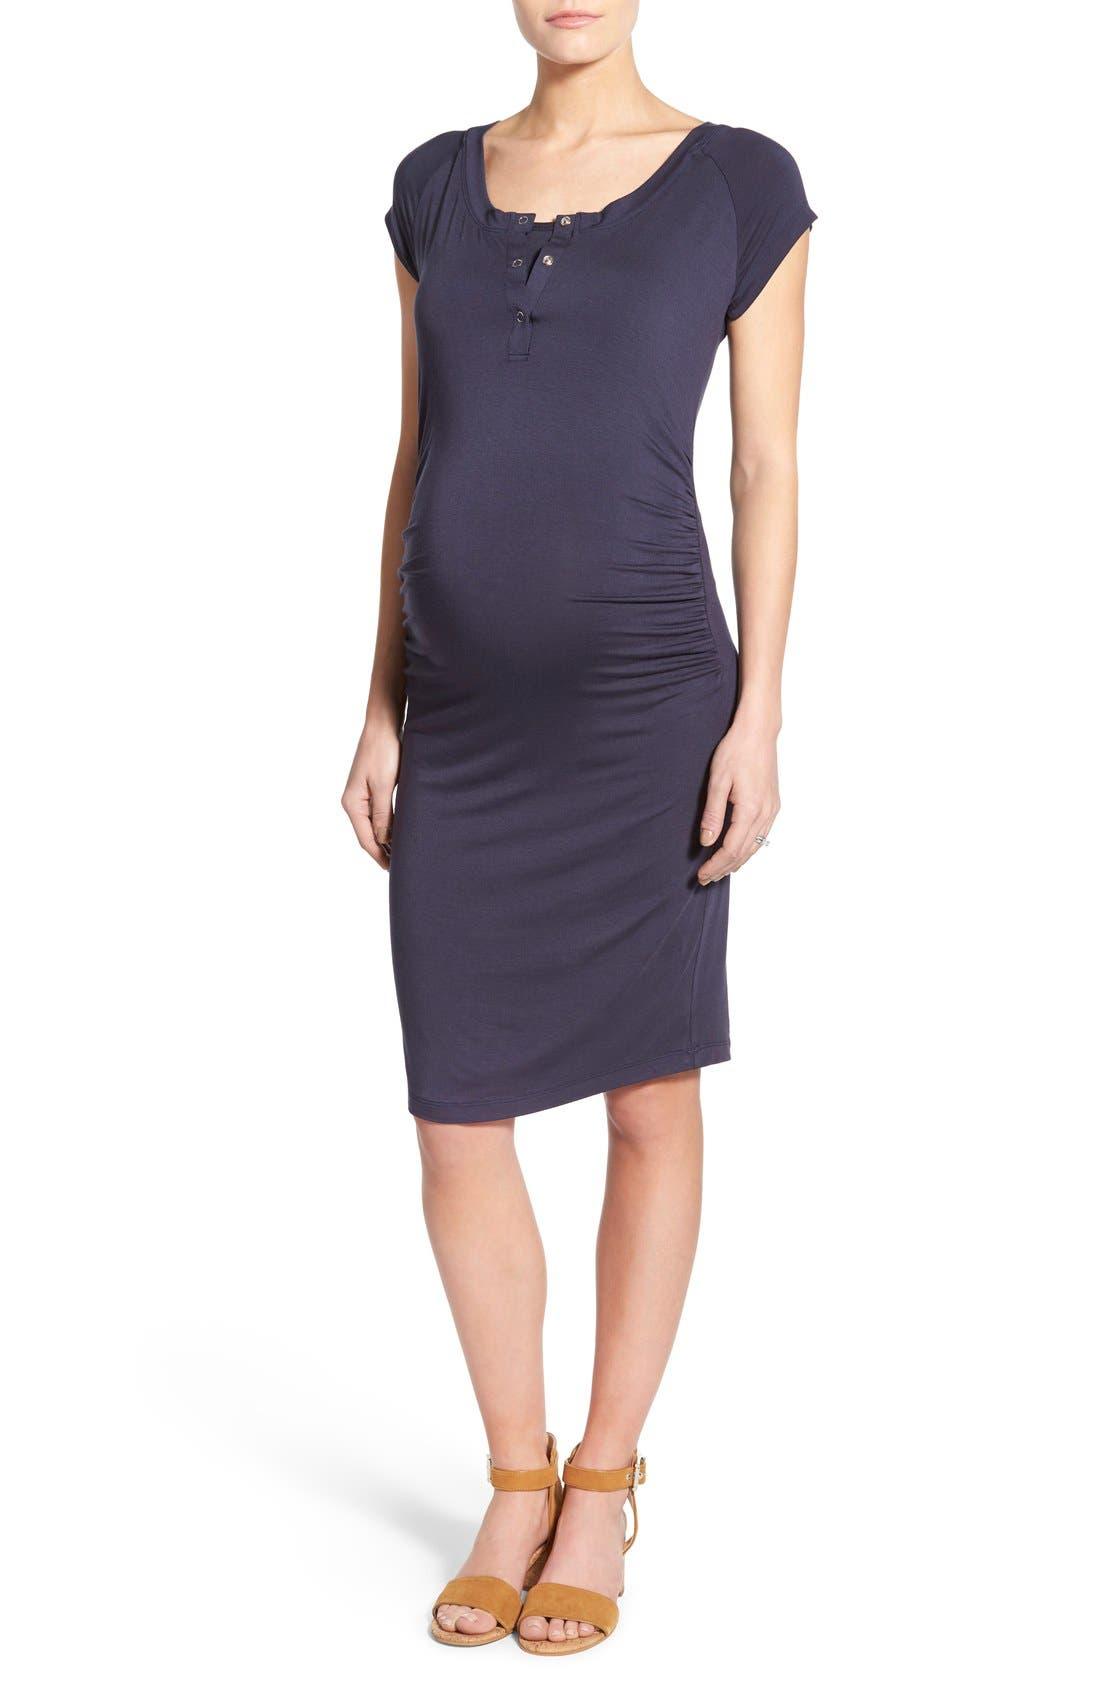 LAB40 'Toni' Maternity/Nursing Midi Dress